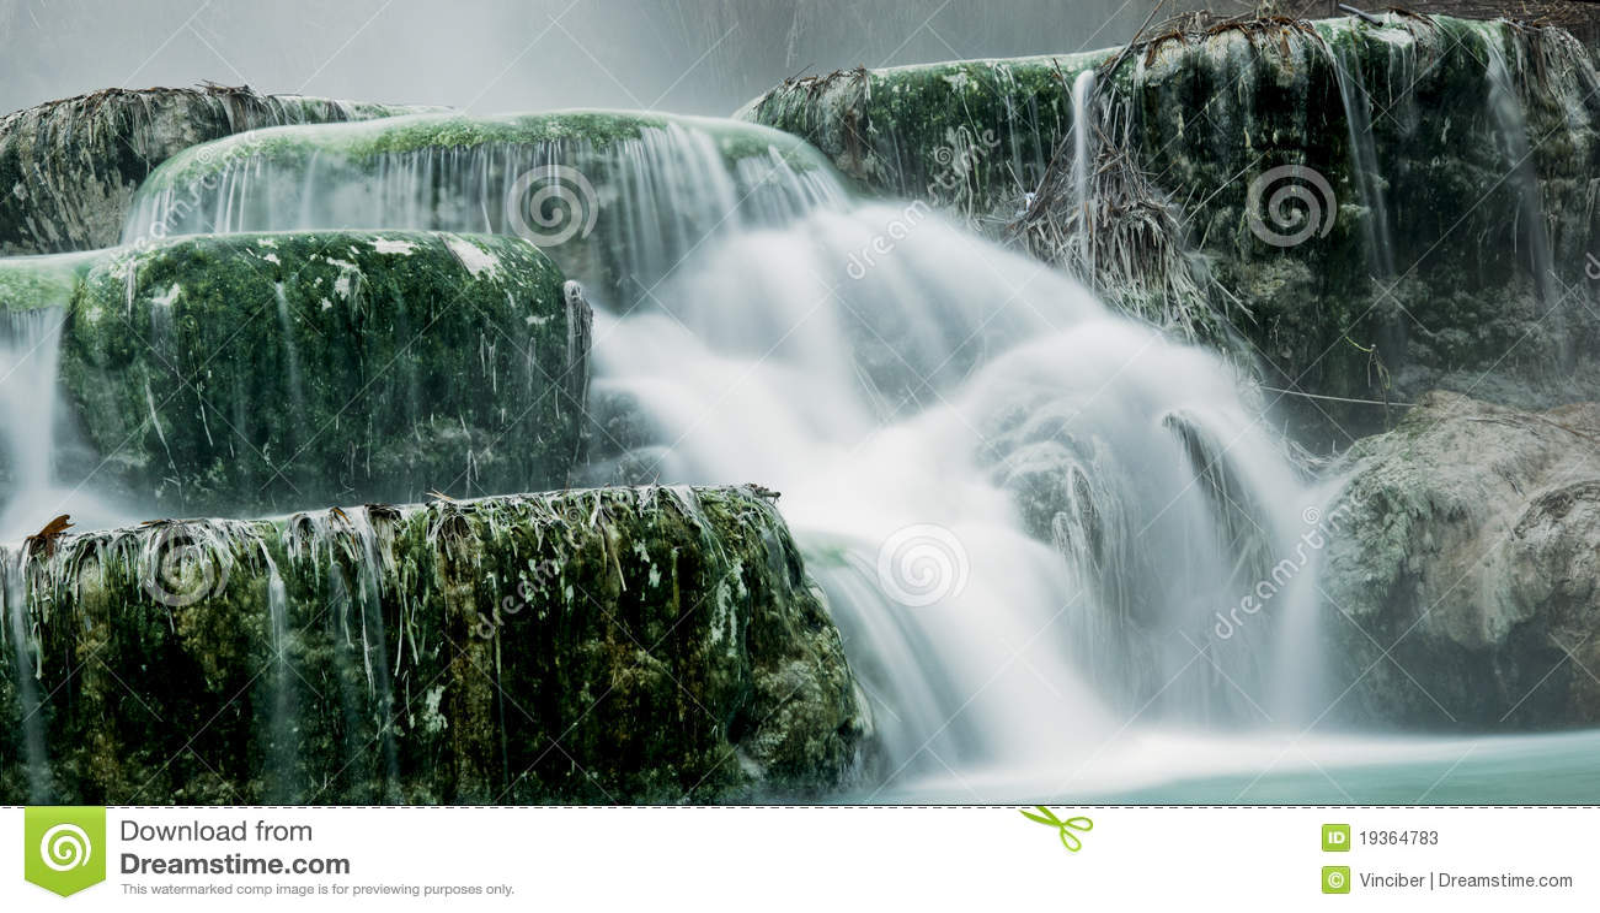 Água térmica para banhar-se.